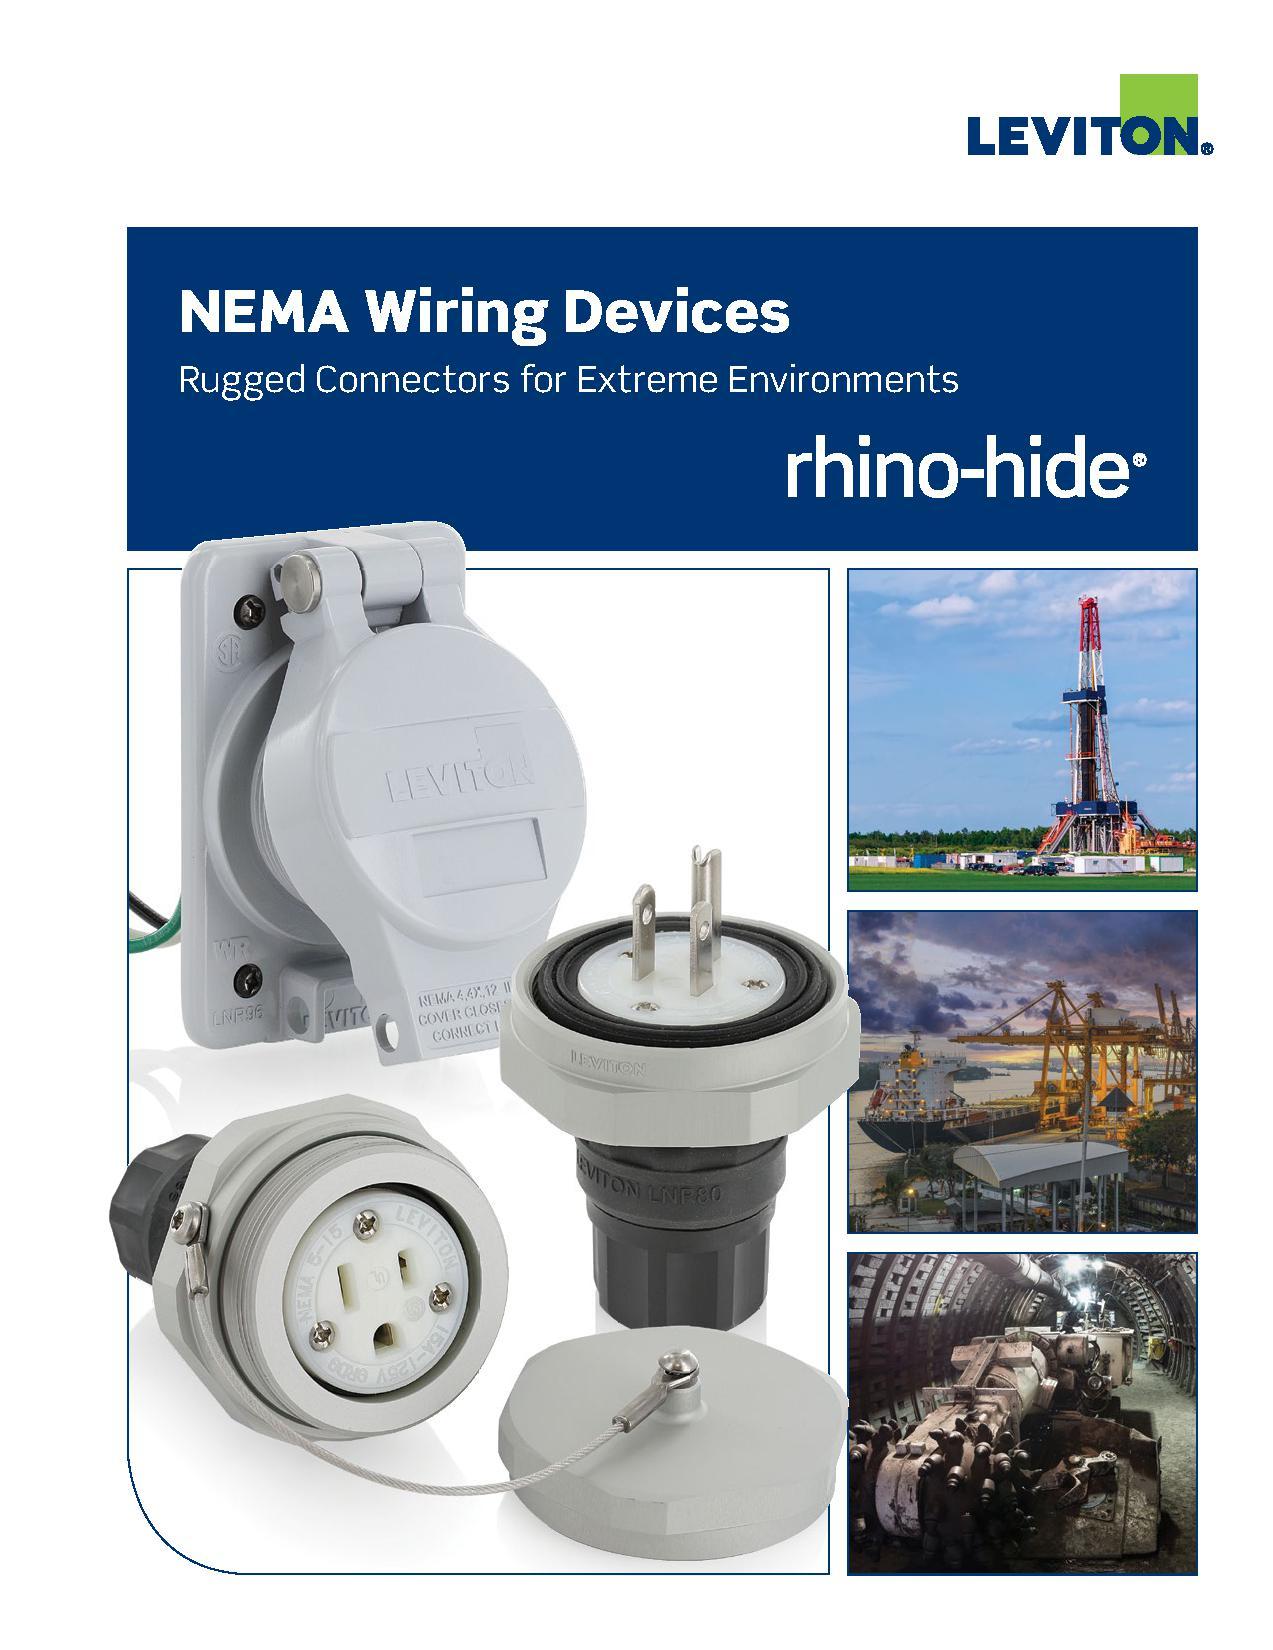 Leviton Rhino-Hide NEMA Wiring Devices | AJB Sales